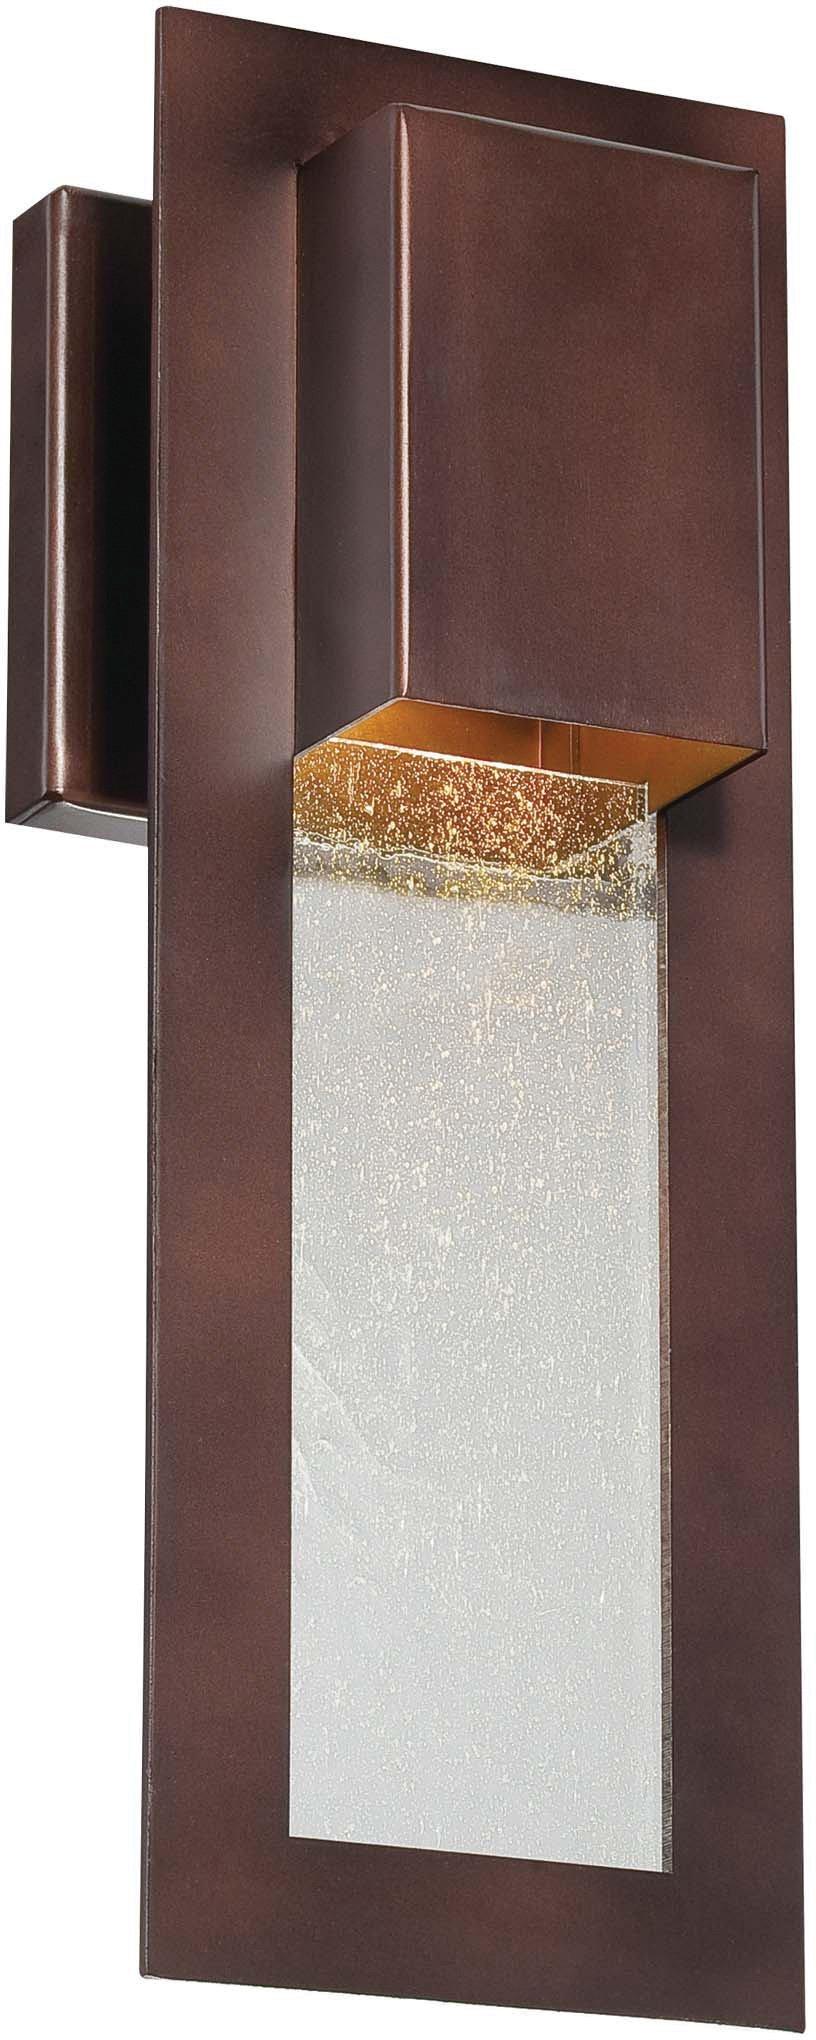 Minka Lavery Outdoor Wall Light 72381-246 Westgate Dark Sky Exterior Wall Lantern, 35w Halogen, Bronze